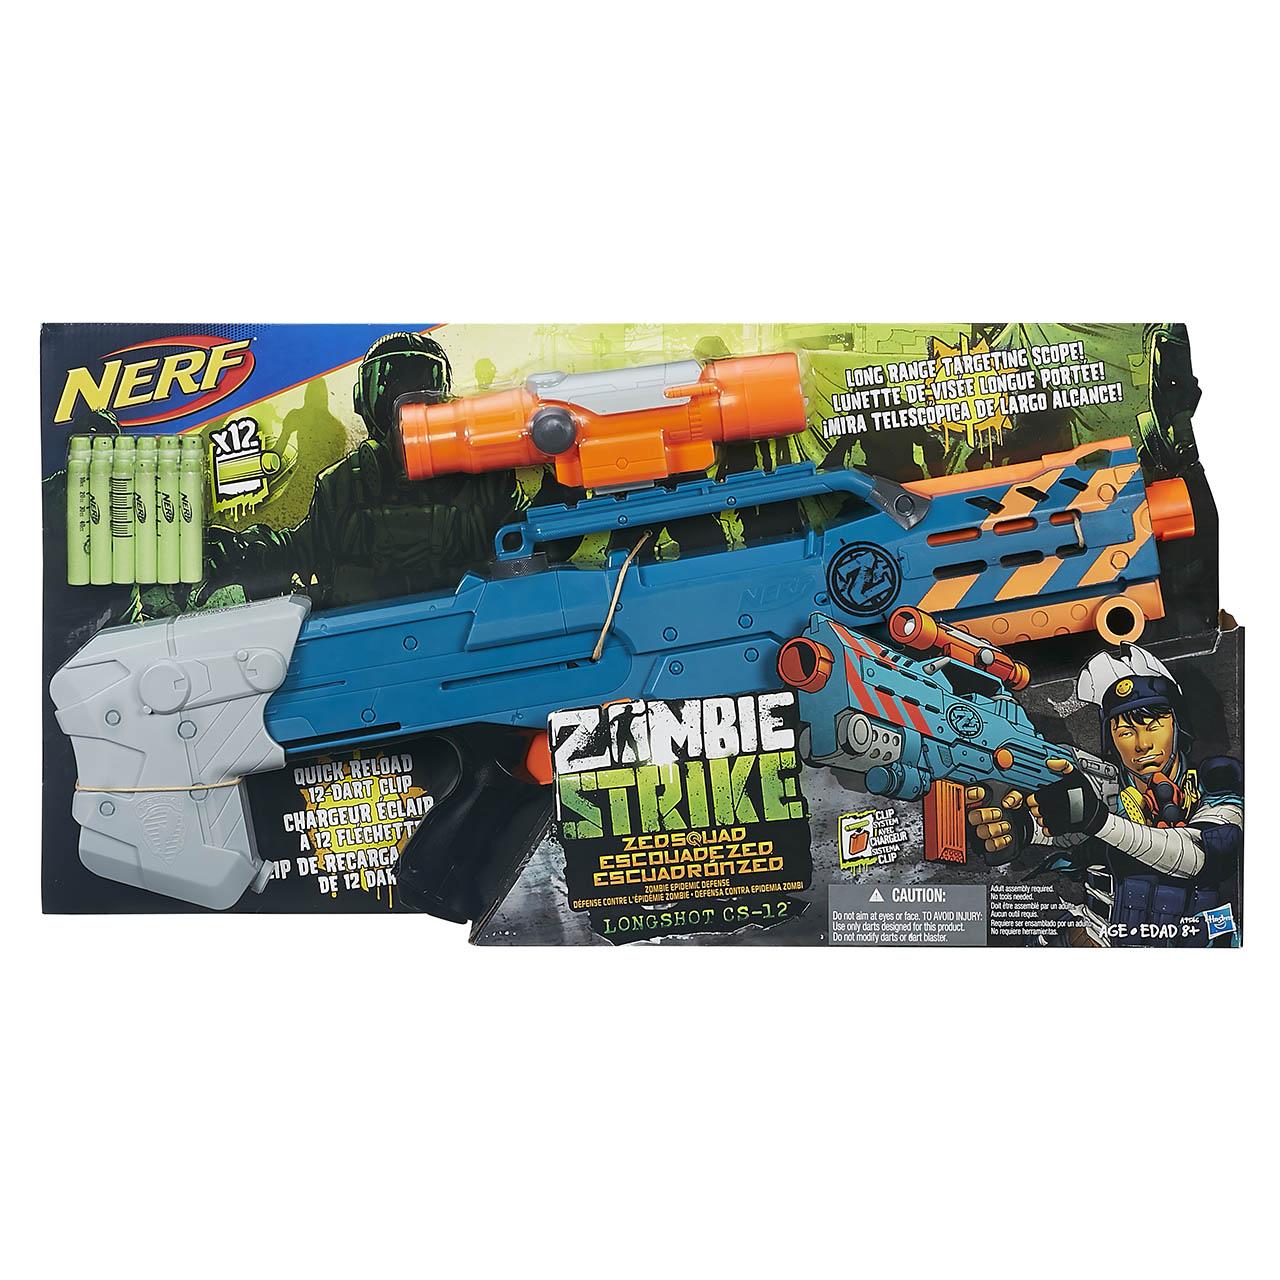 NERF Zombie strike zed squad longshot cs 12 (target)